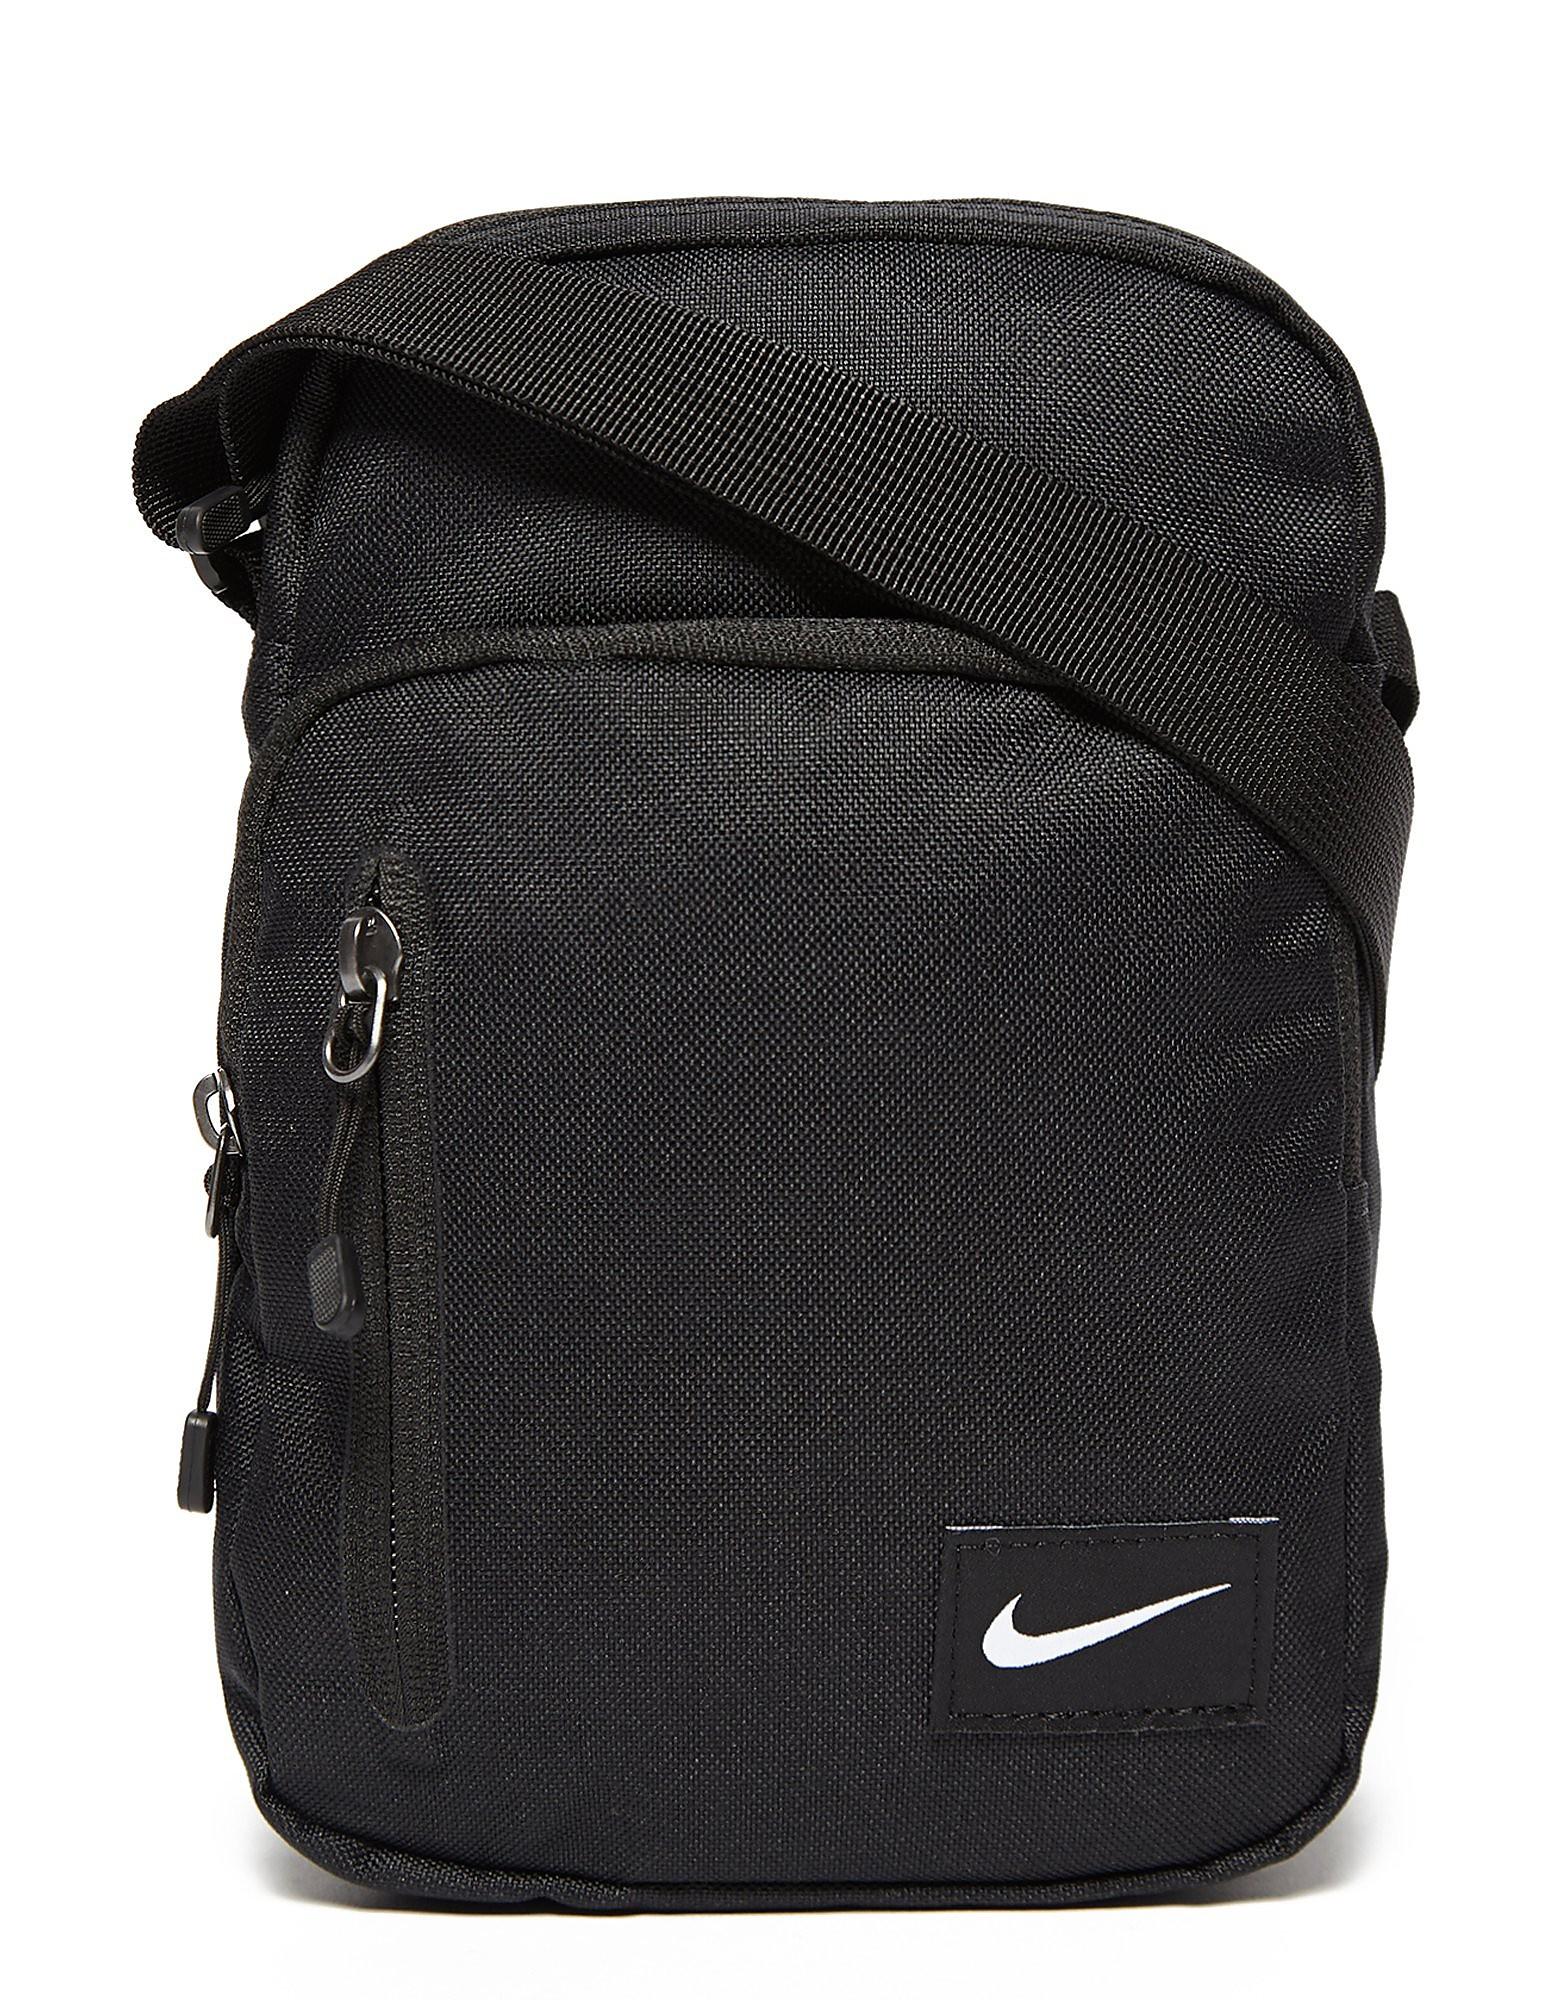 Nike Core Small Items Bag II